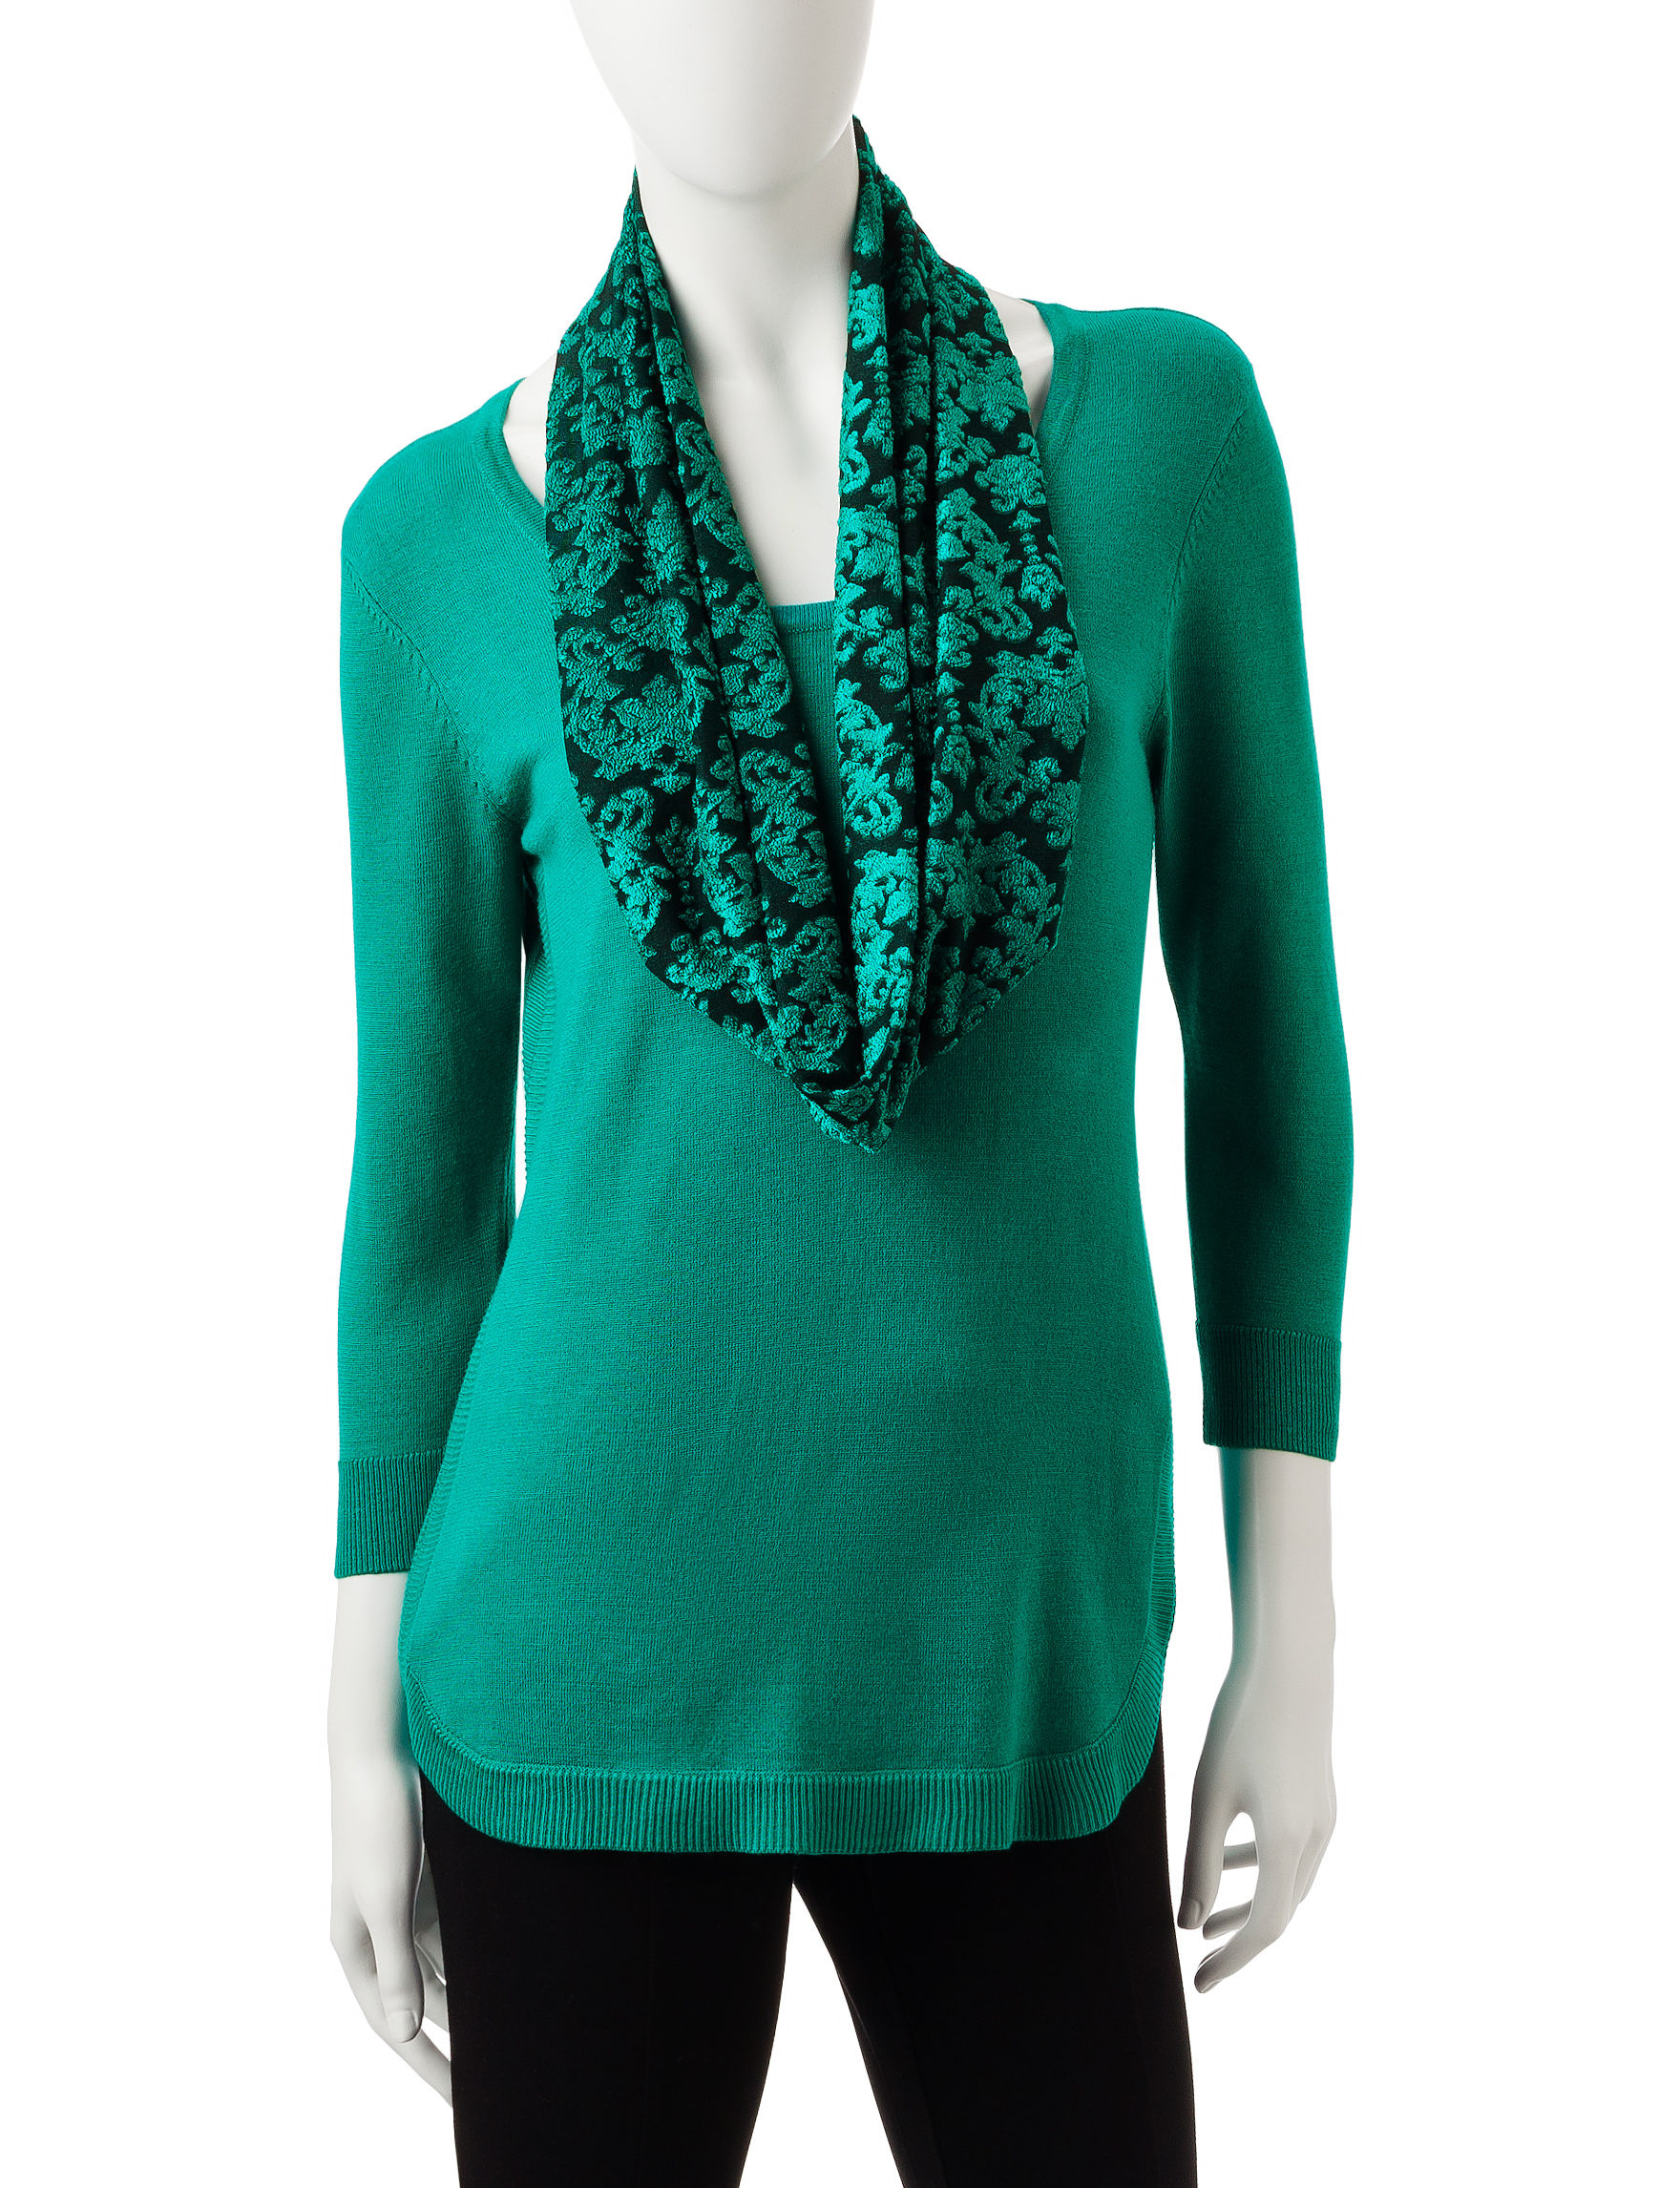 Rebecca Malone Turquoise Shirts & Blouses